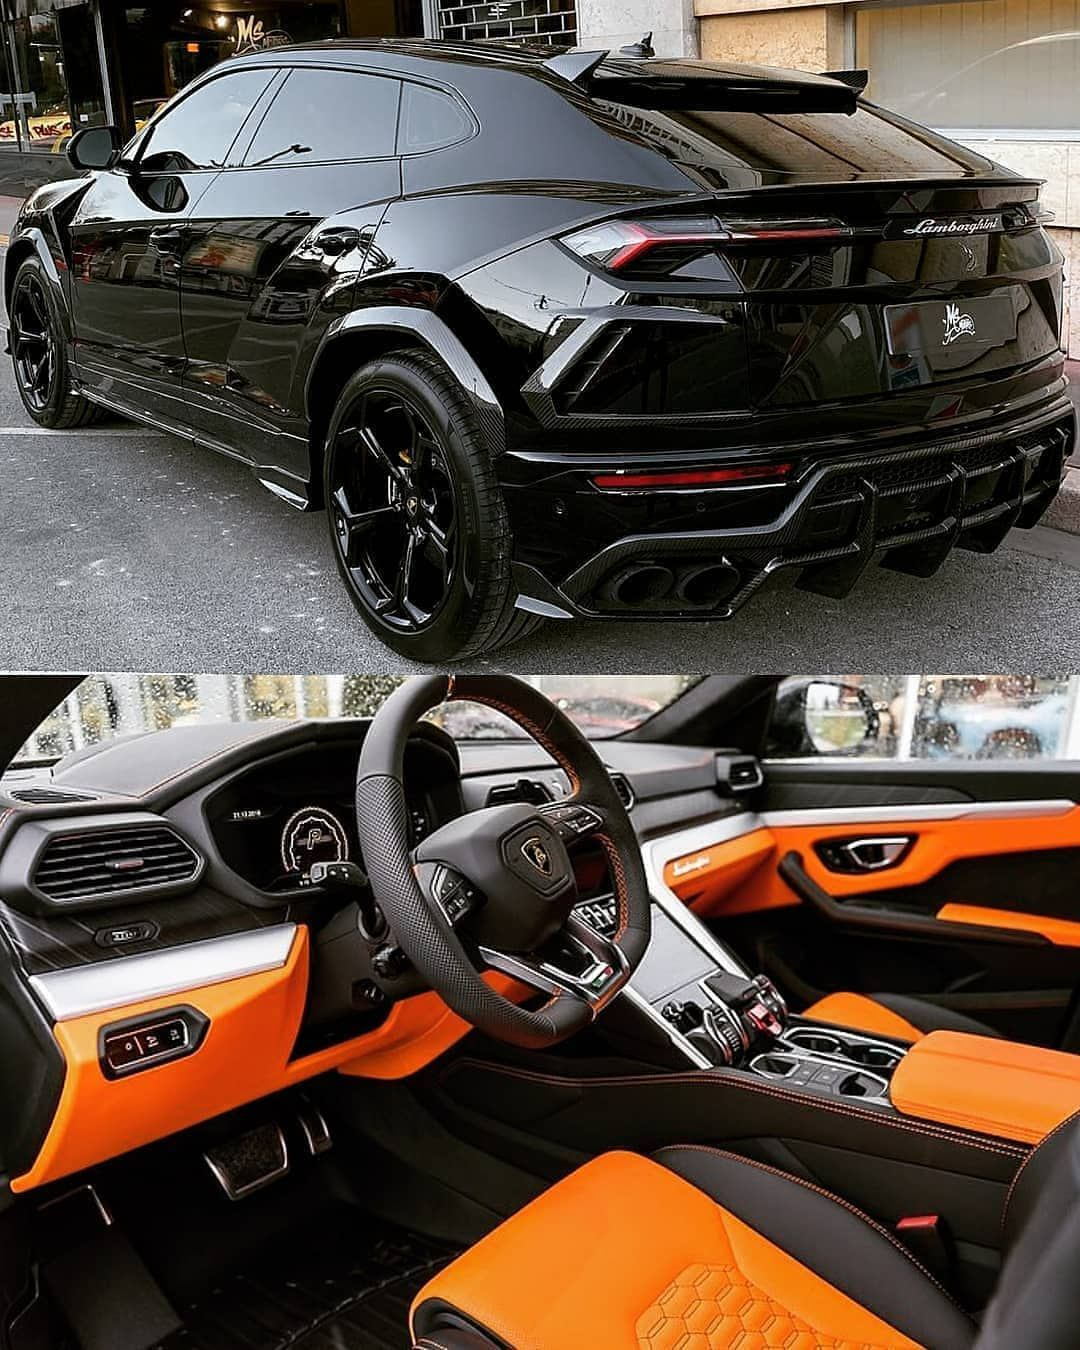 2019 Lamborghini Urus C High Boss Life With Images Luxury Cars